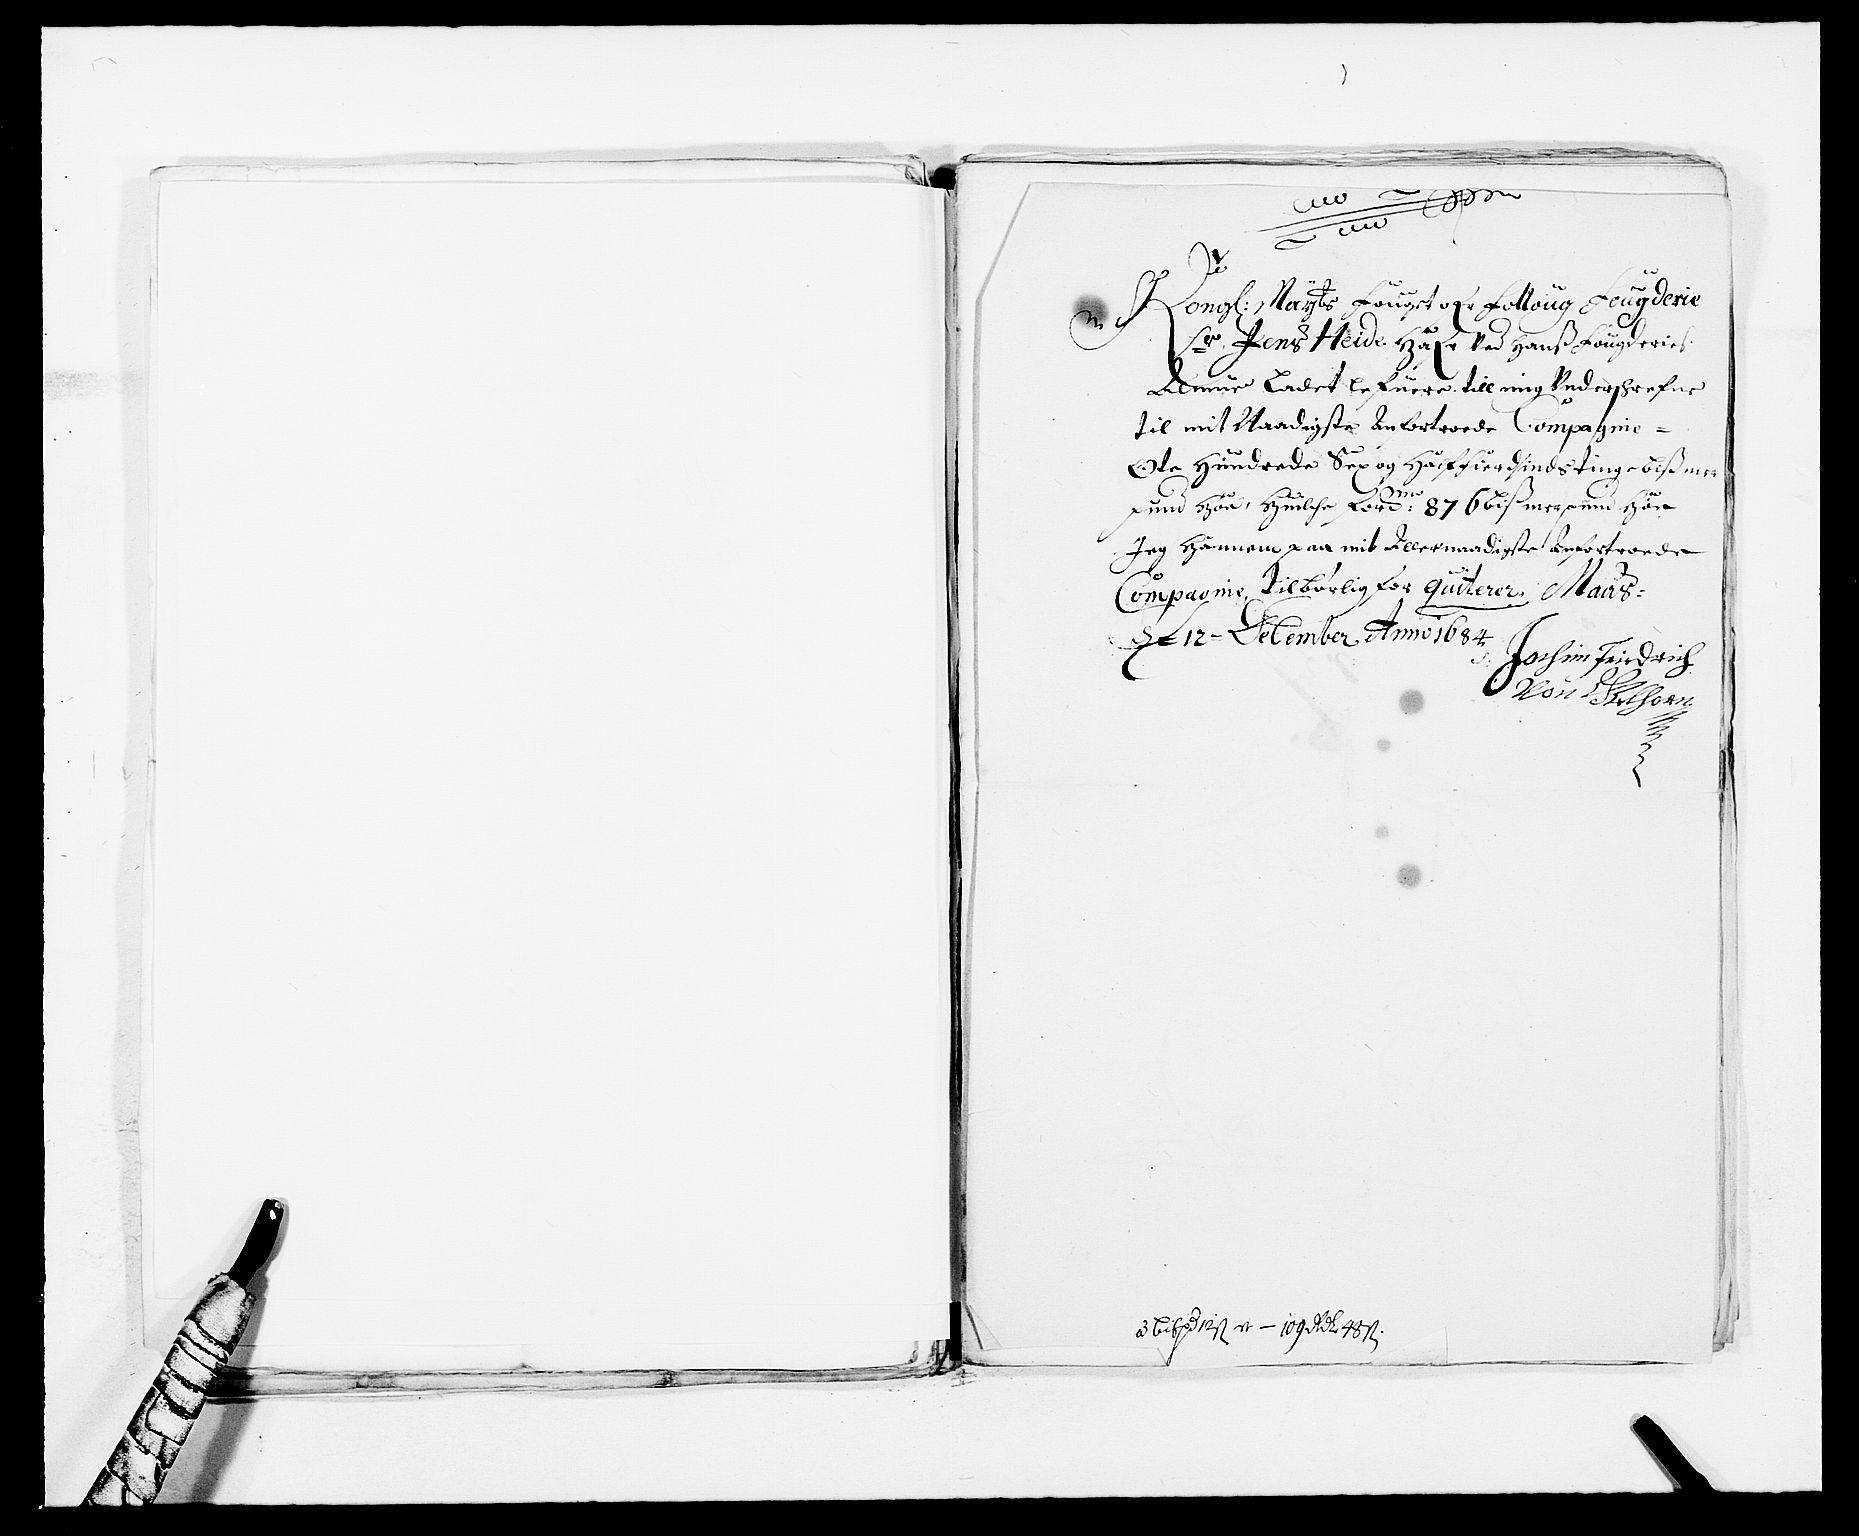 RA, Rentekammeret inntil 1814, Reviderte regnskaper, Fogderegnskap, R09/L0432: Fogderegnskap Follo, 1680-1684, s. 122